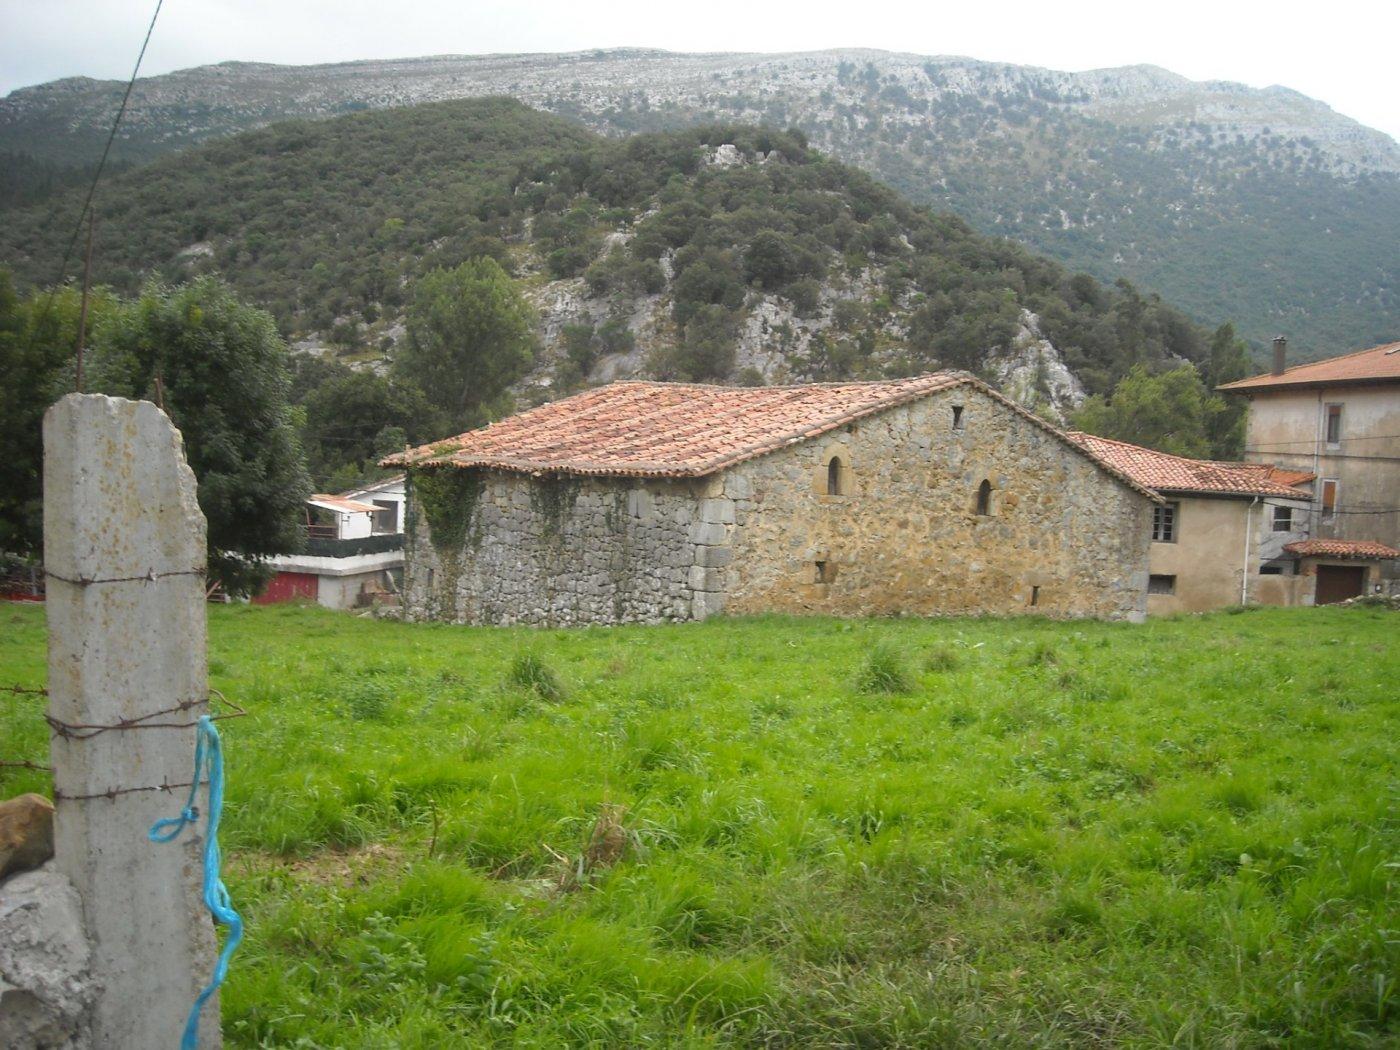 Casa con terreno en Ruesga - CANTABRIA